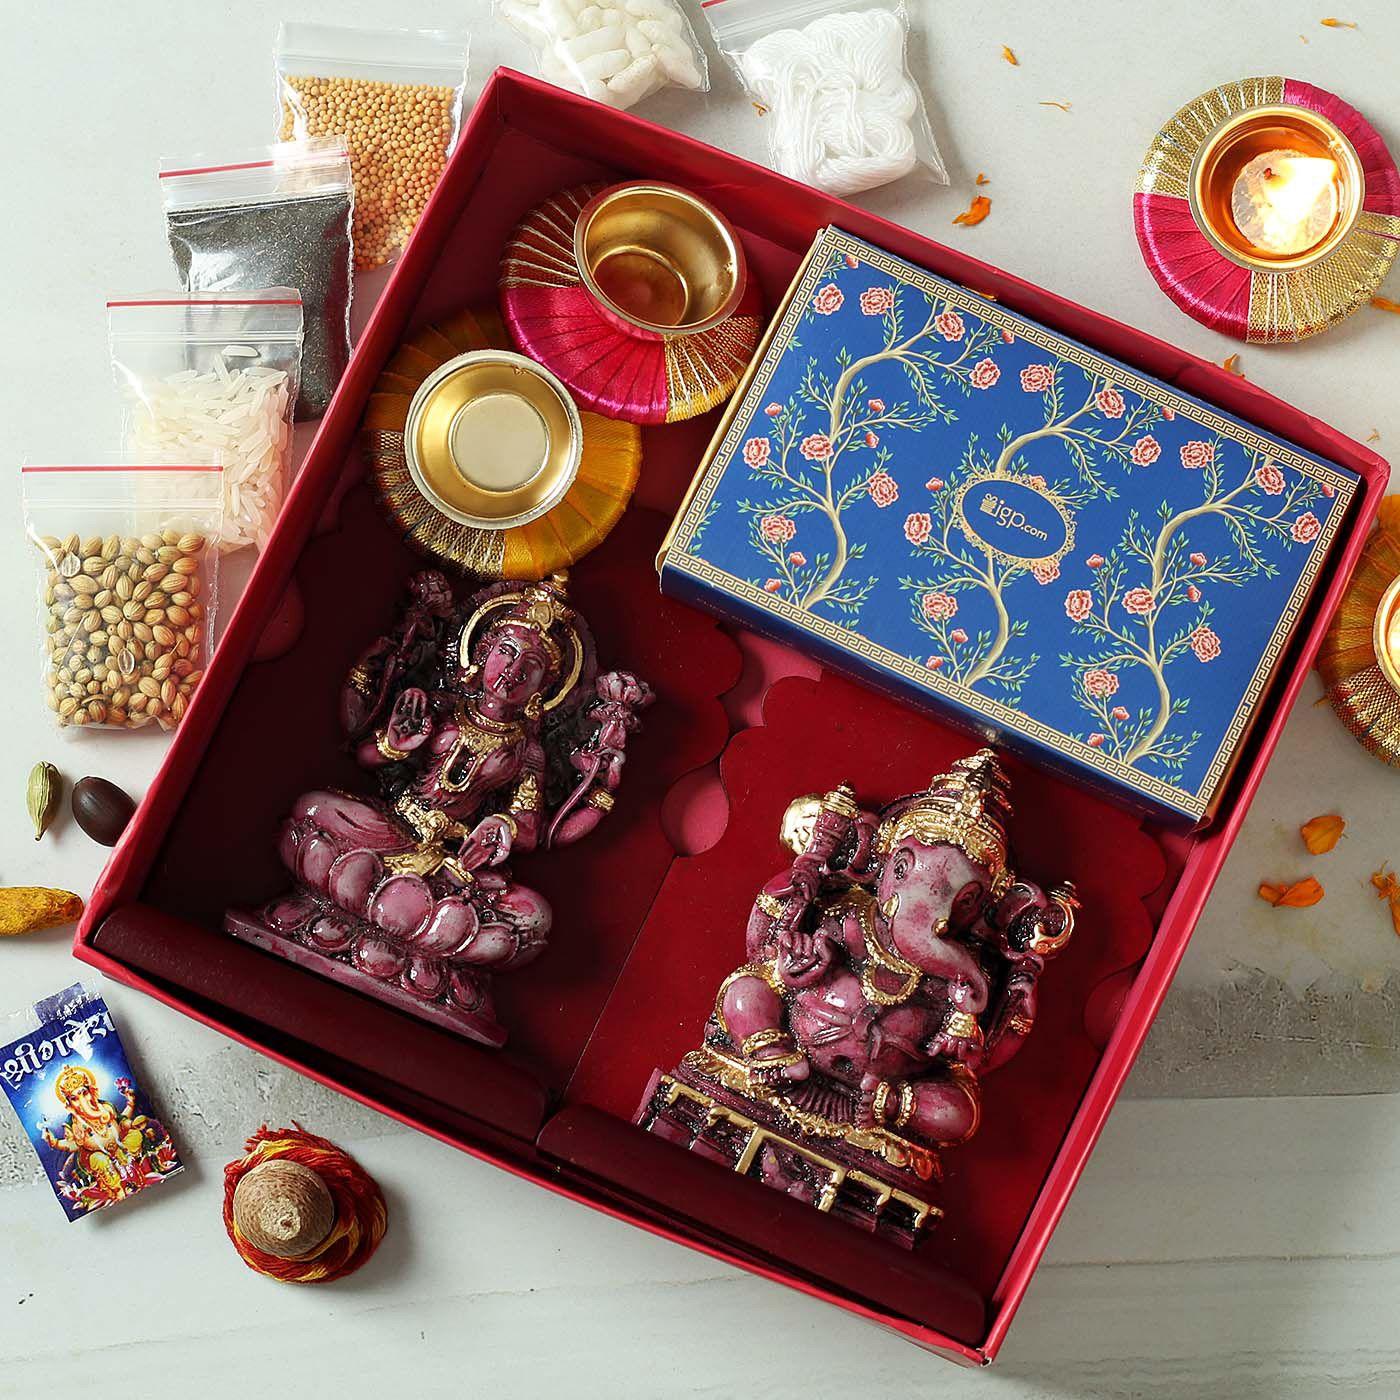 Laxmi Ganesha Idols With Designer Diya In Gift Box Gift Send Diwali Gifts Online J11120977 Igp Com In 2020 Diwali Gifts Diwali Candles Online Gifts